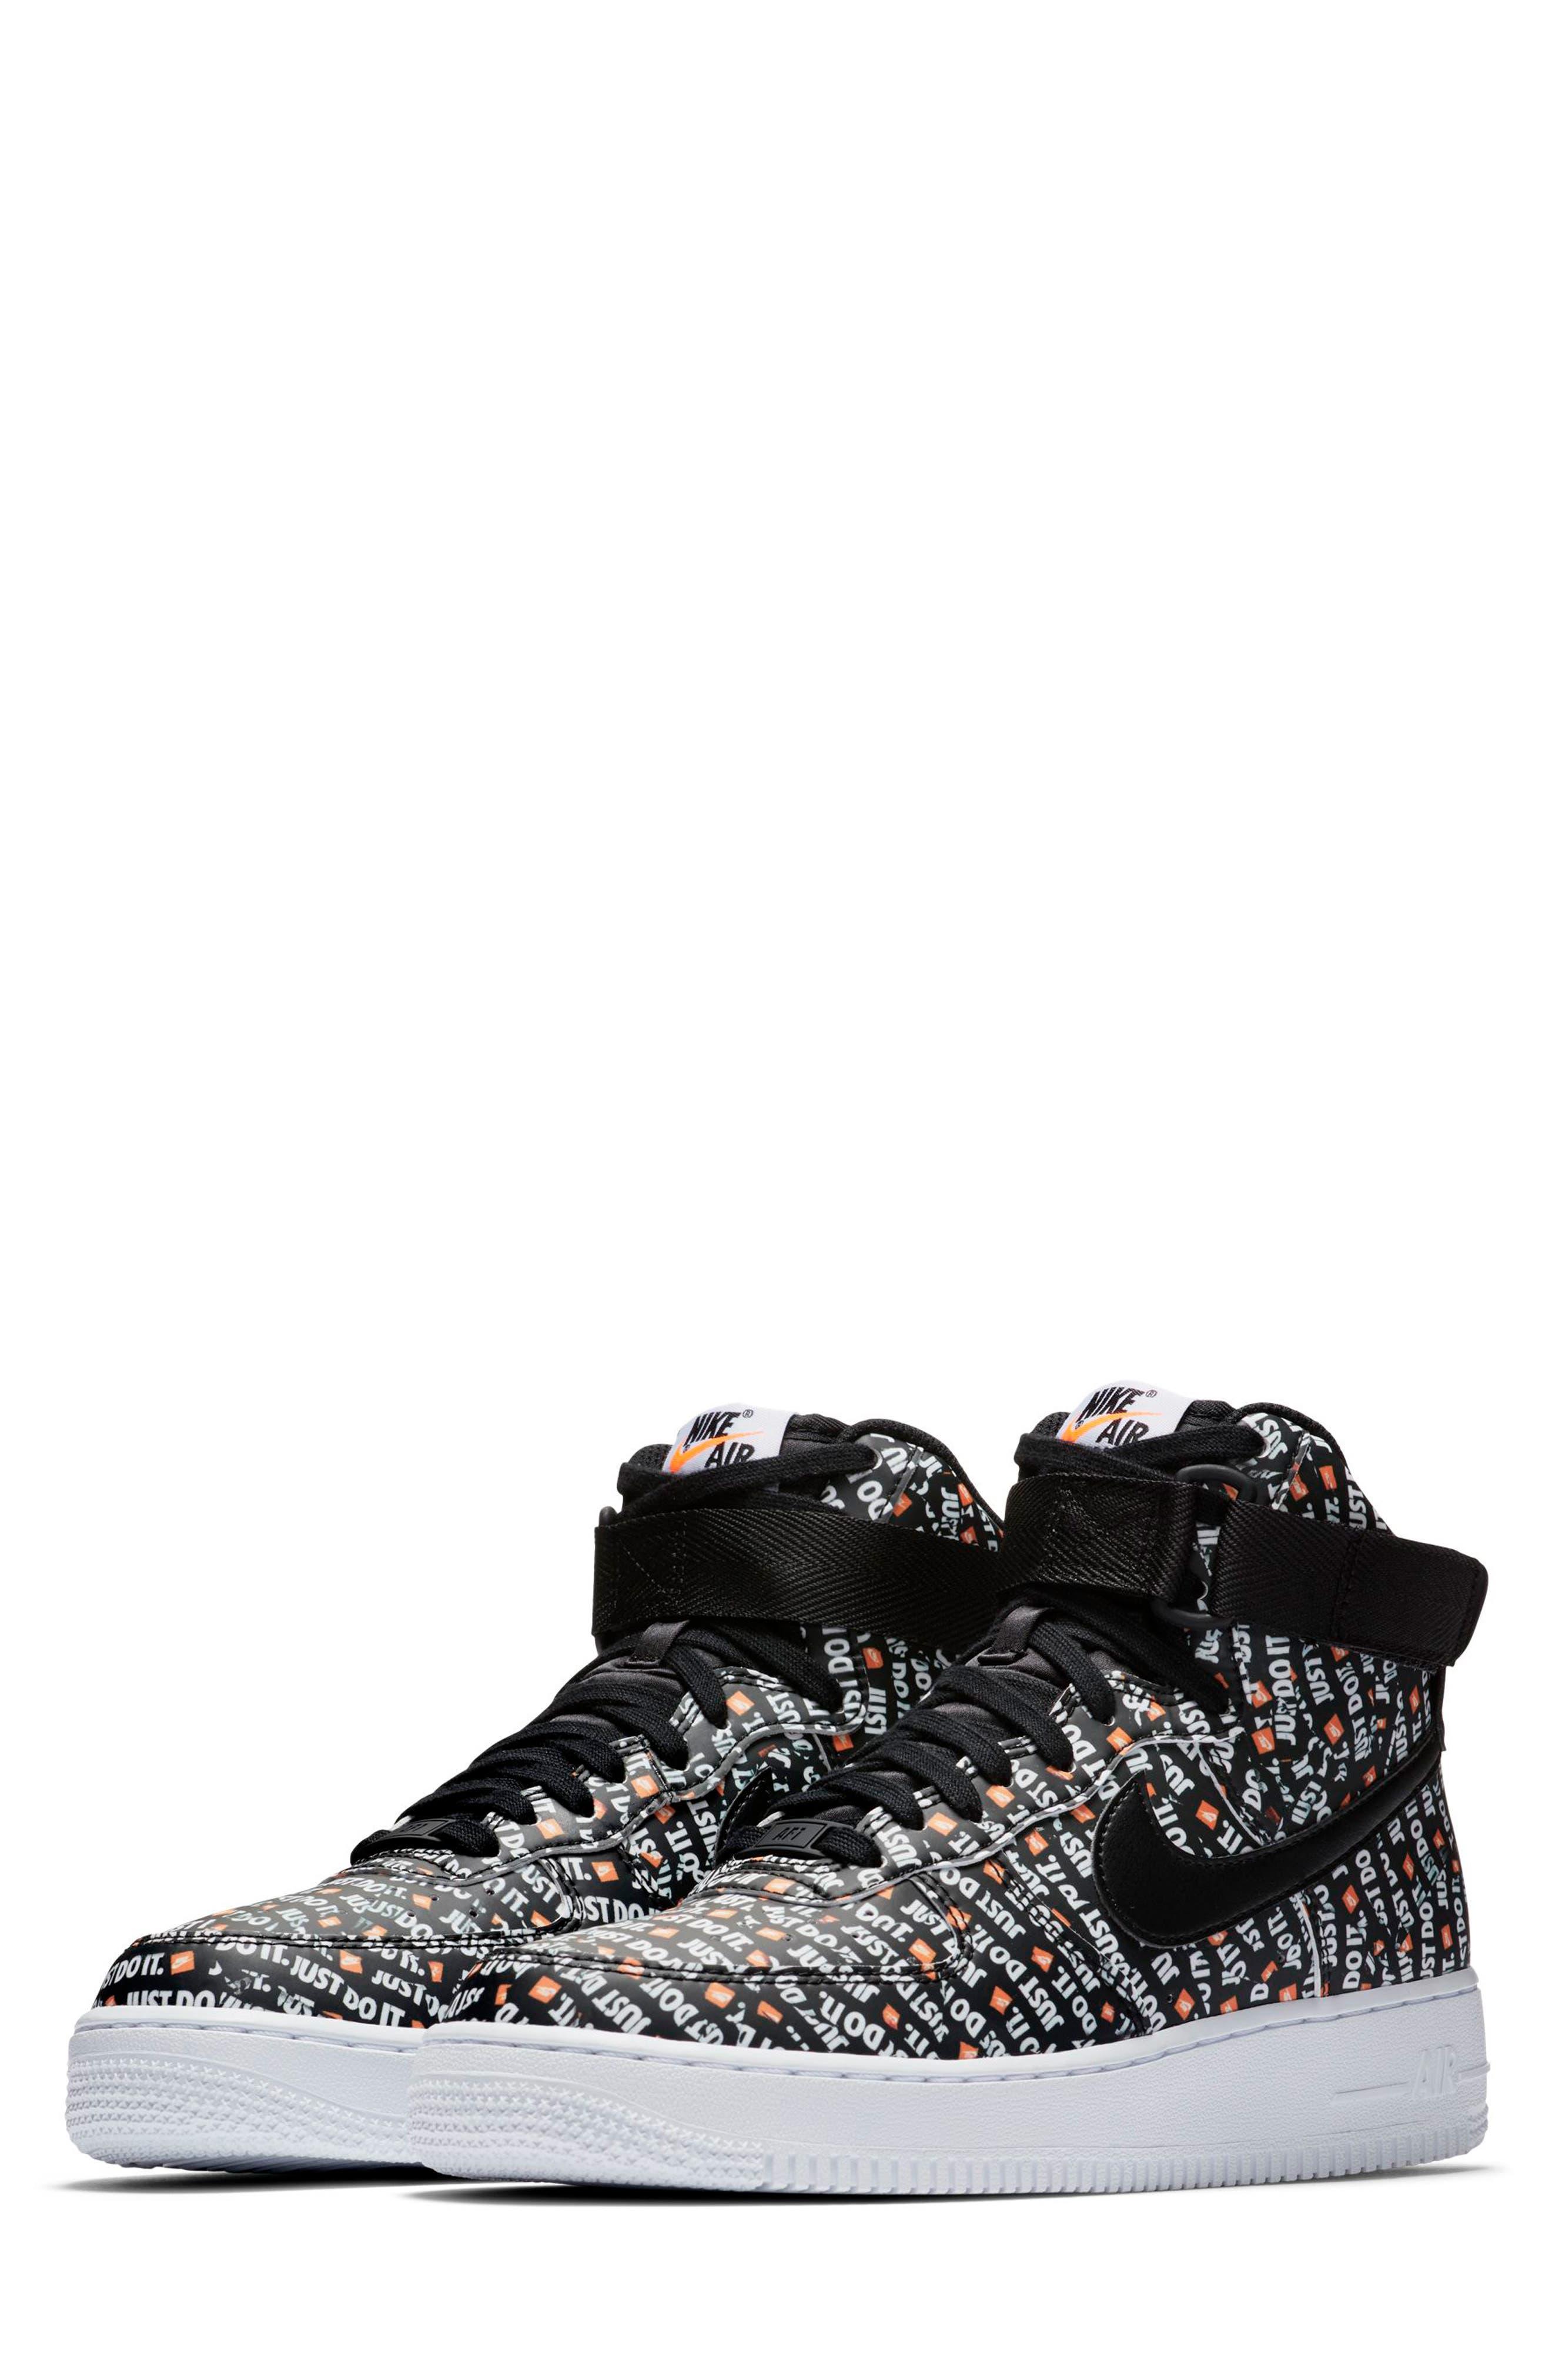 Air Force 1 High LX High Top Sneaker,                             Main thumbnail 1, color,                             BLACK